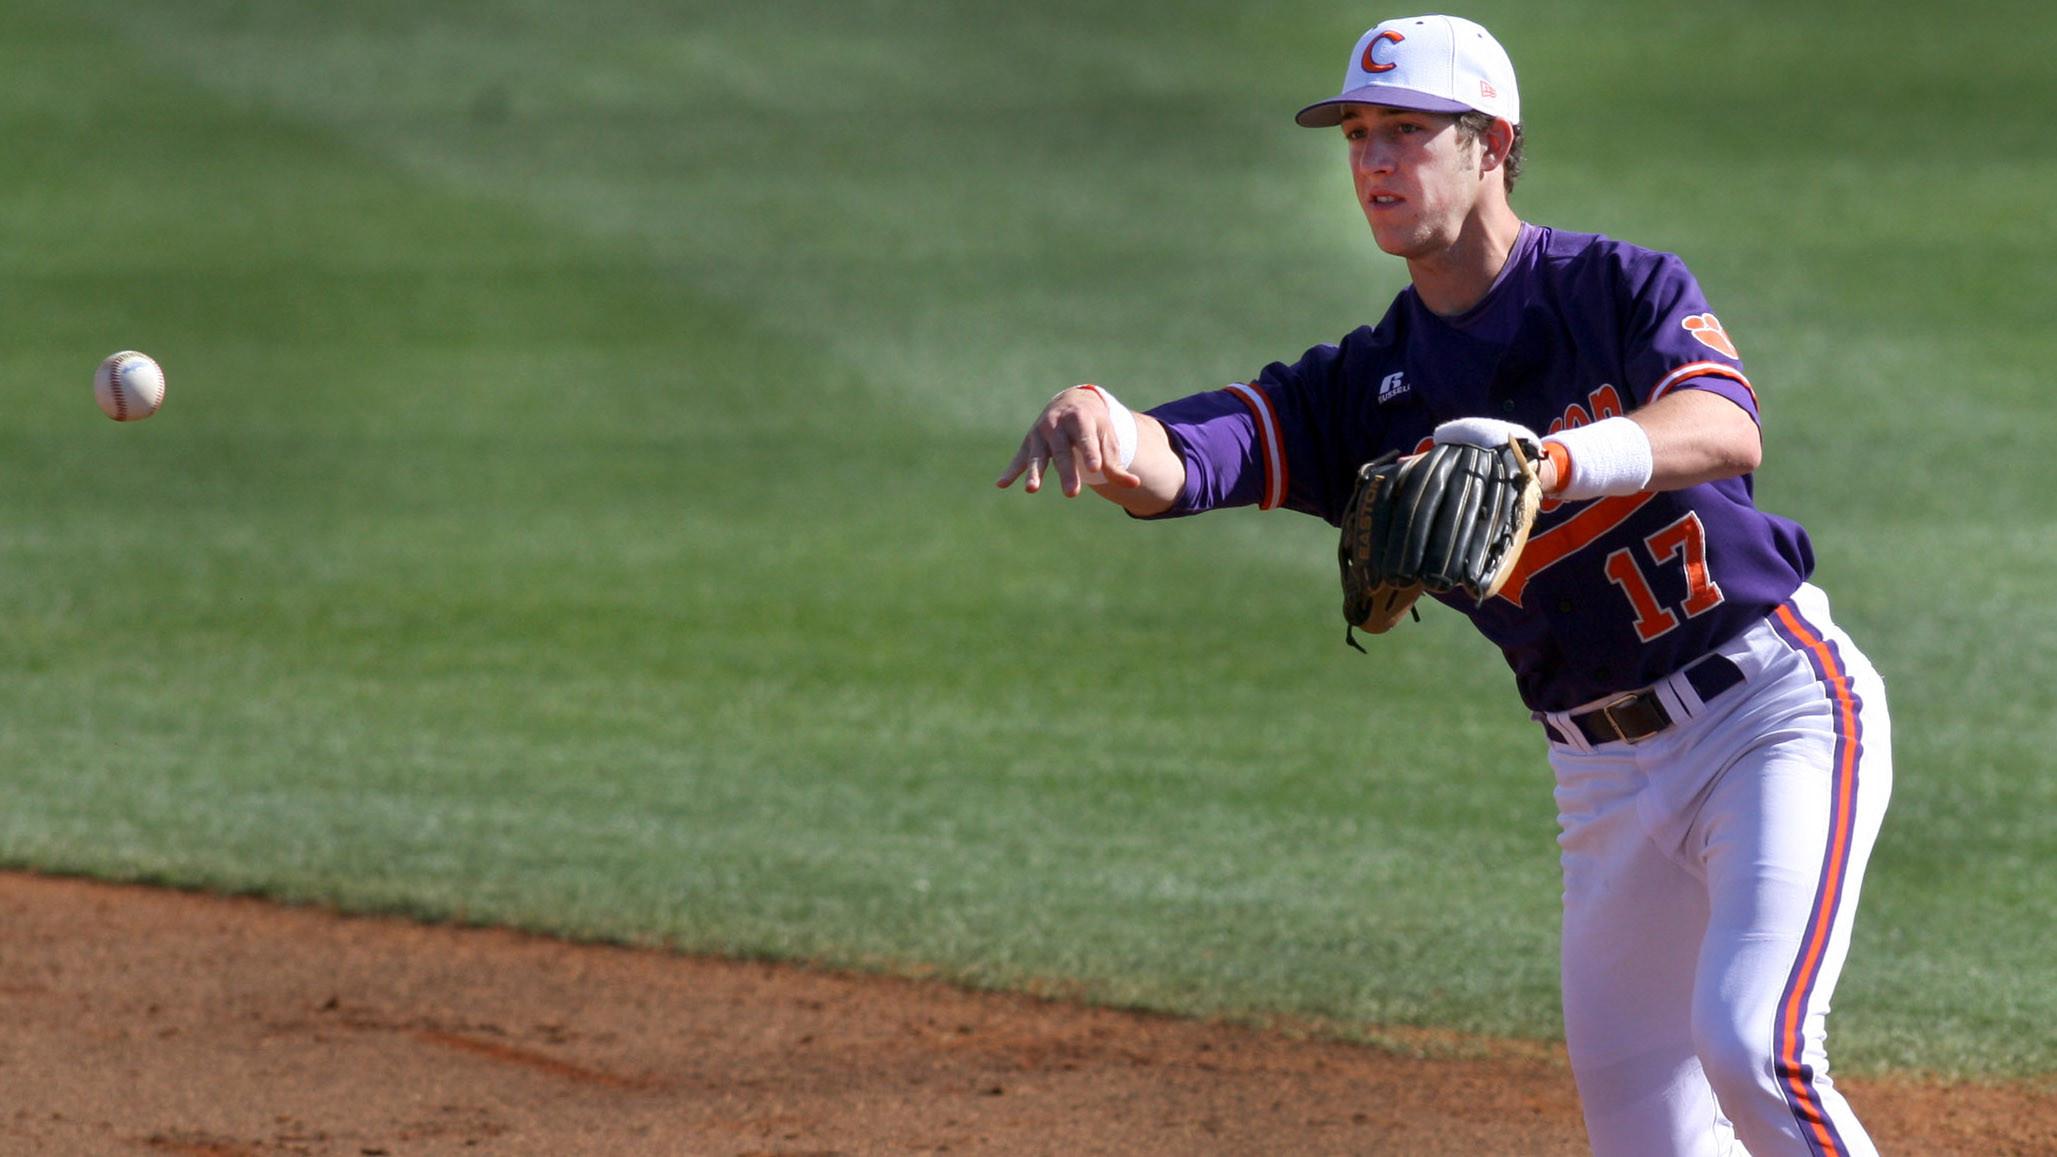 Tigers to Play Host to Duke Friday-Sunday